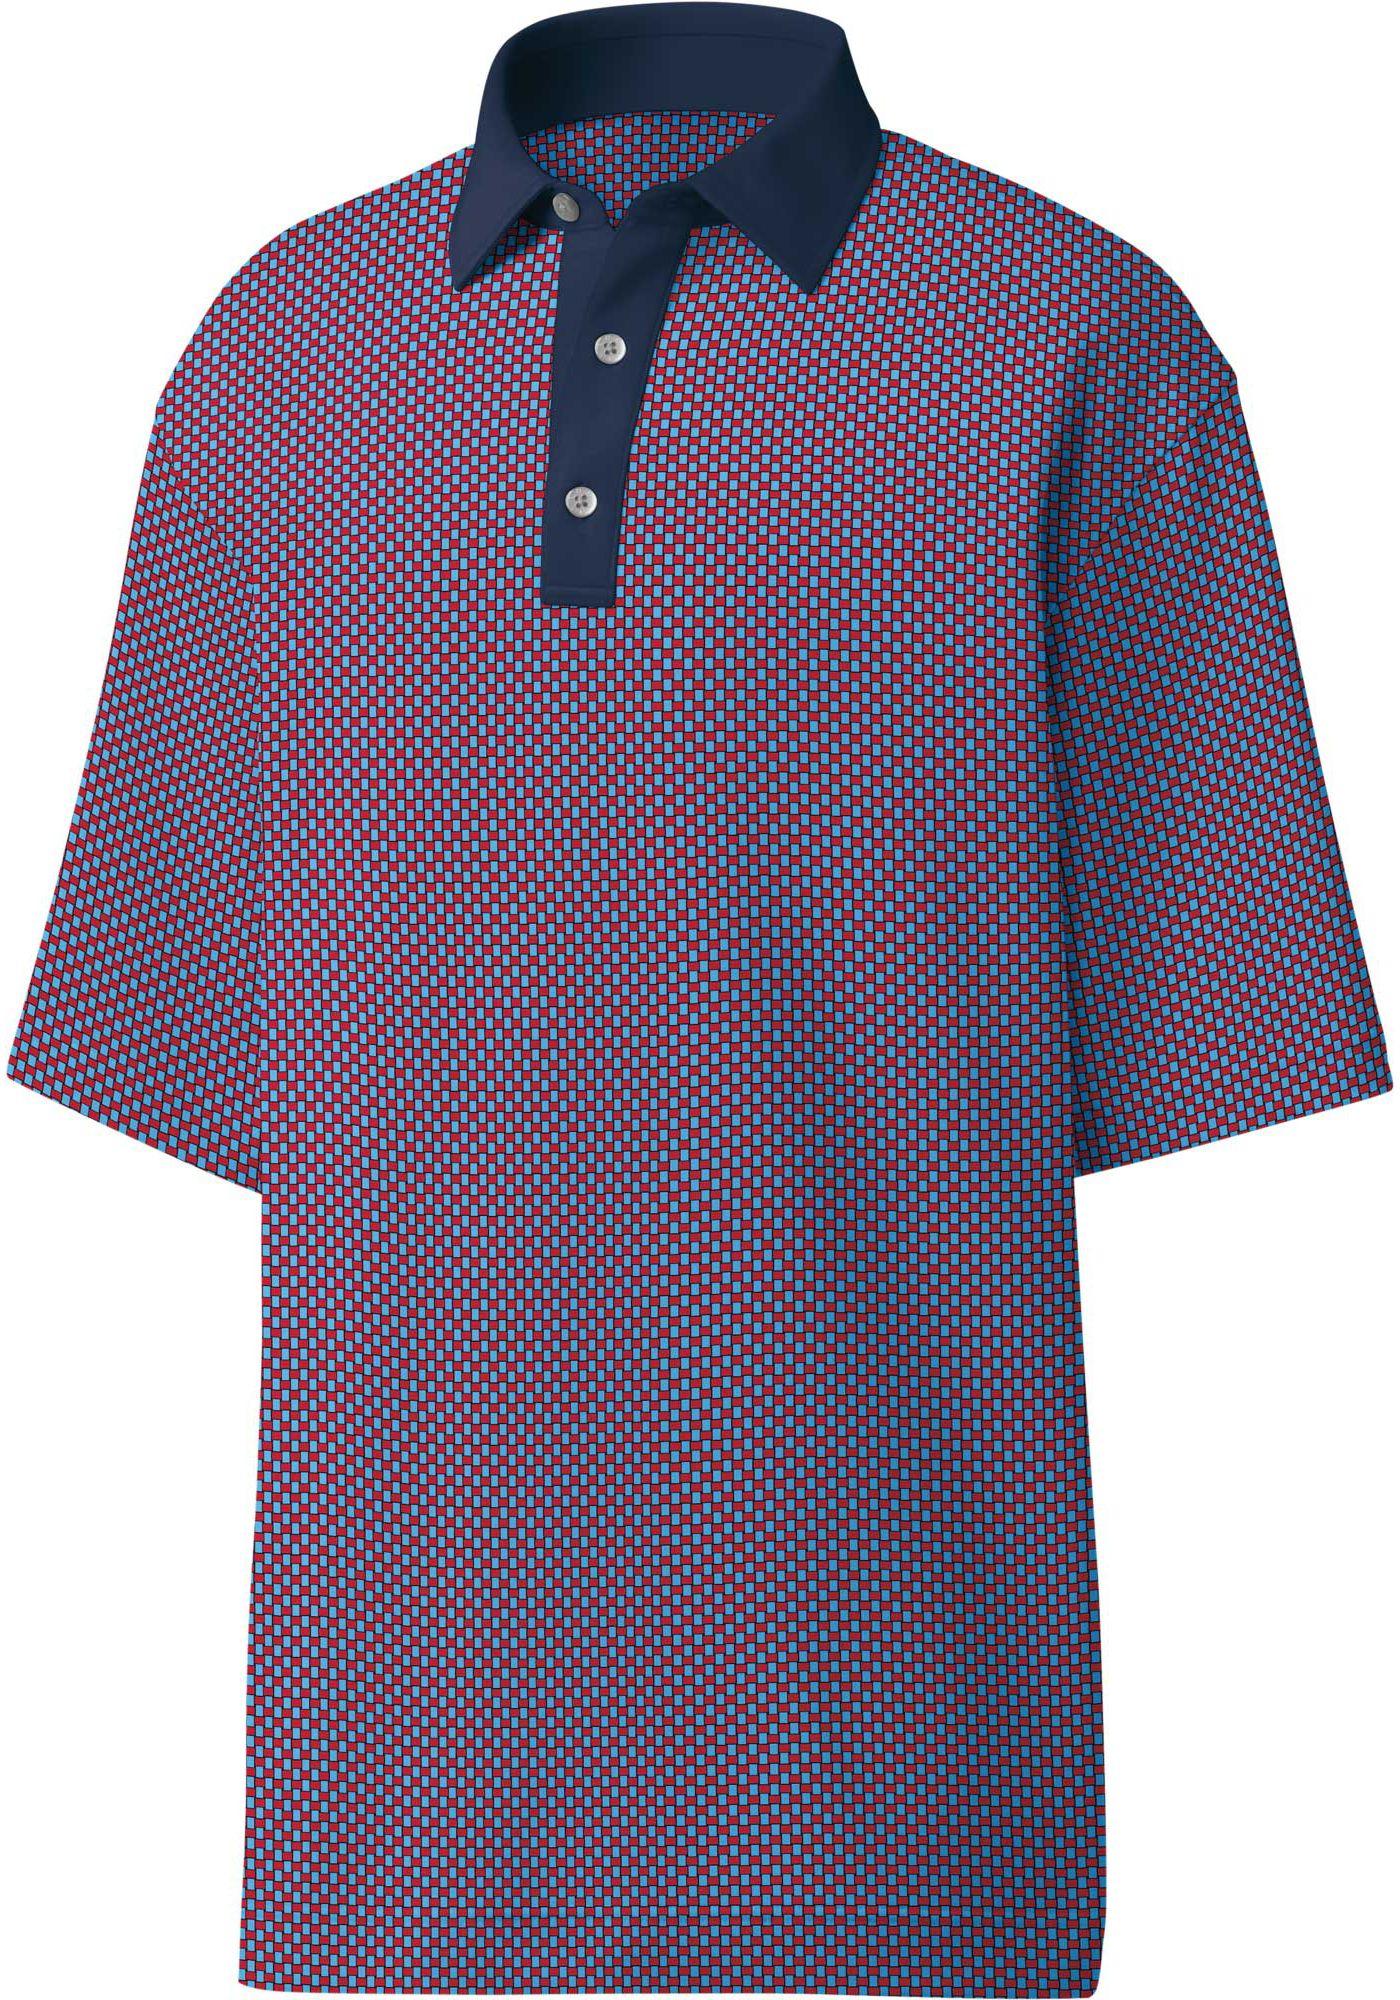 FootJoy Men's Lisle ProDry Basketweave Print Golf Polo